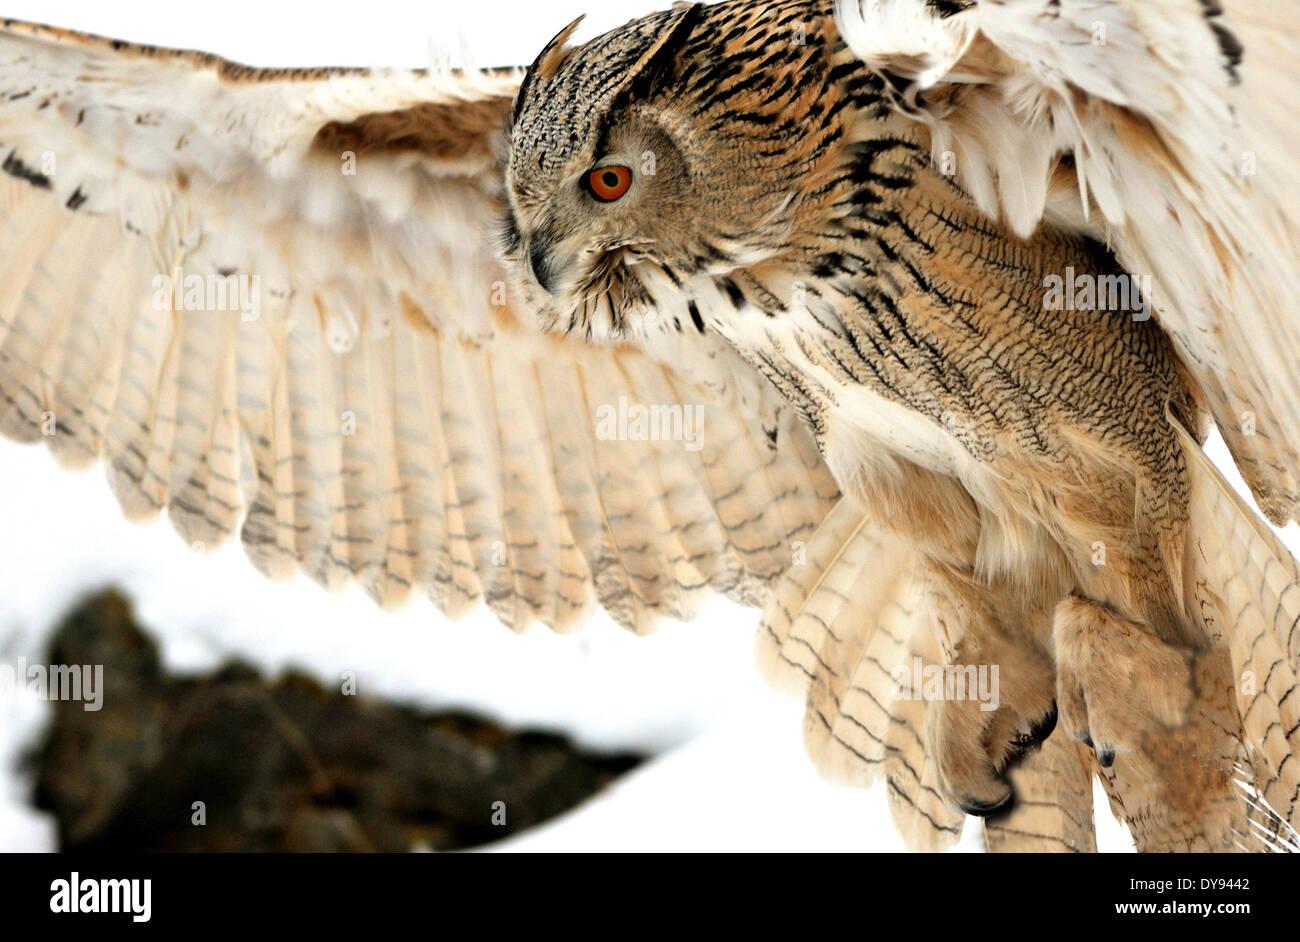 Eule Eulen sibirischen Eule Bubo Bubo Sibiricus Eulen-ähnliche Nachtvögel Beute Vögel Vogel Raptor Tier Tiere Deutschland Stockfoto